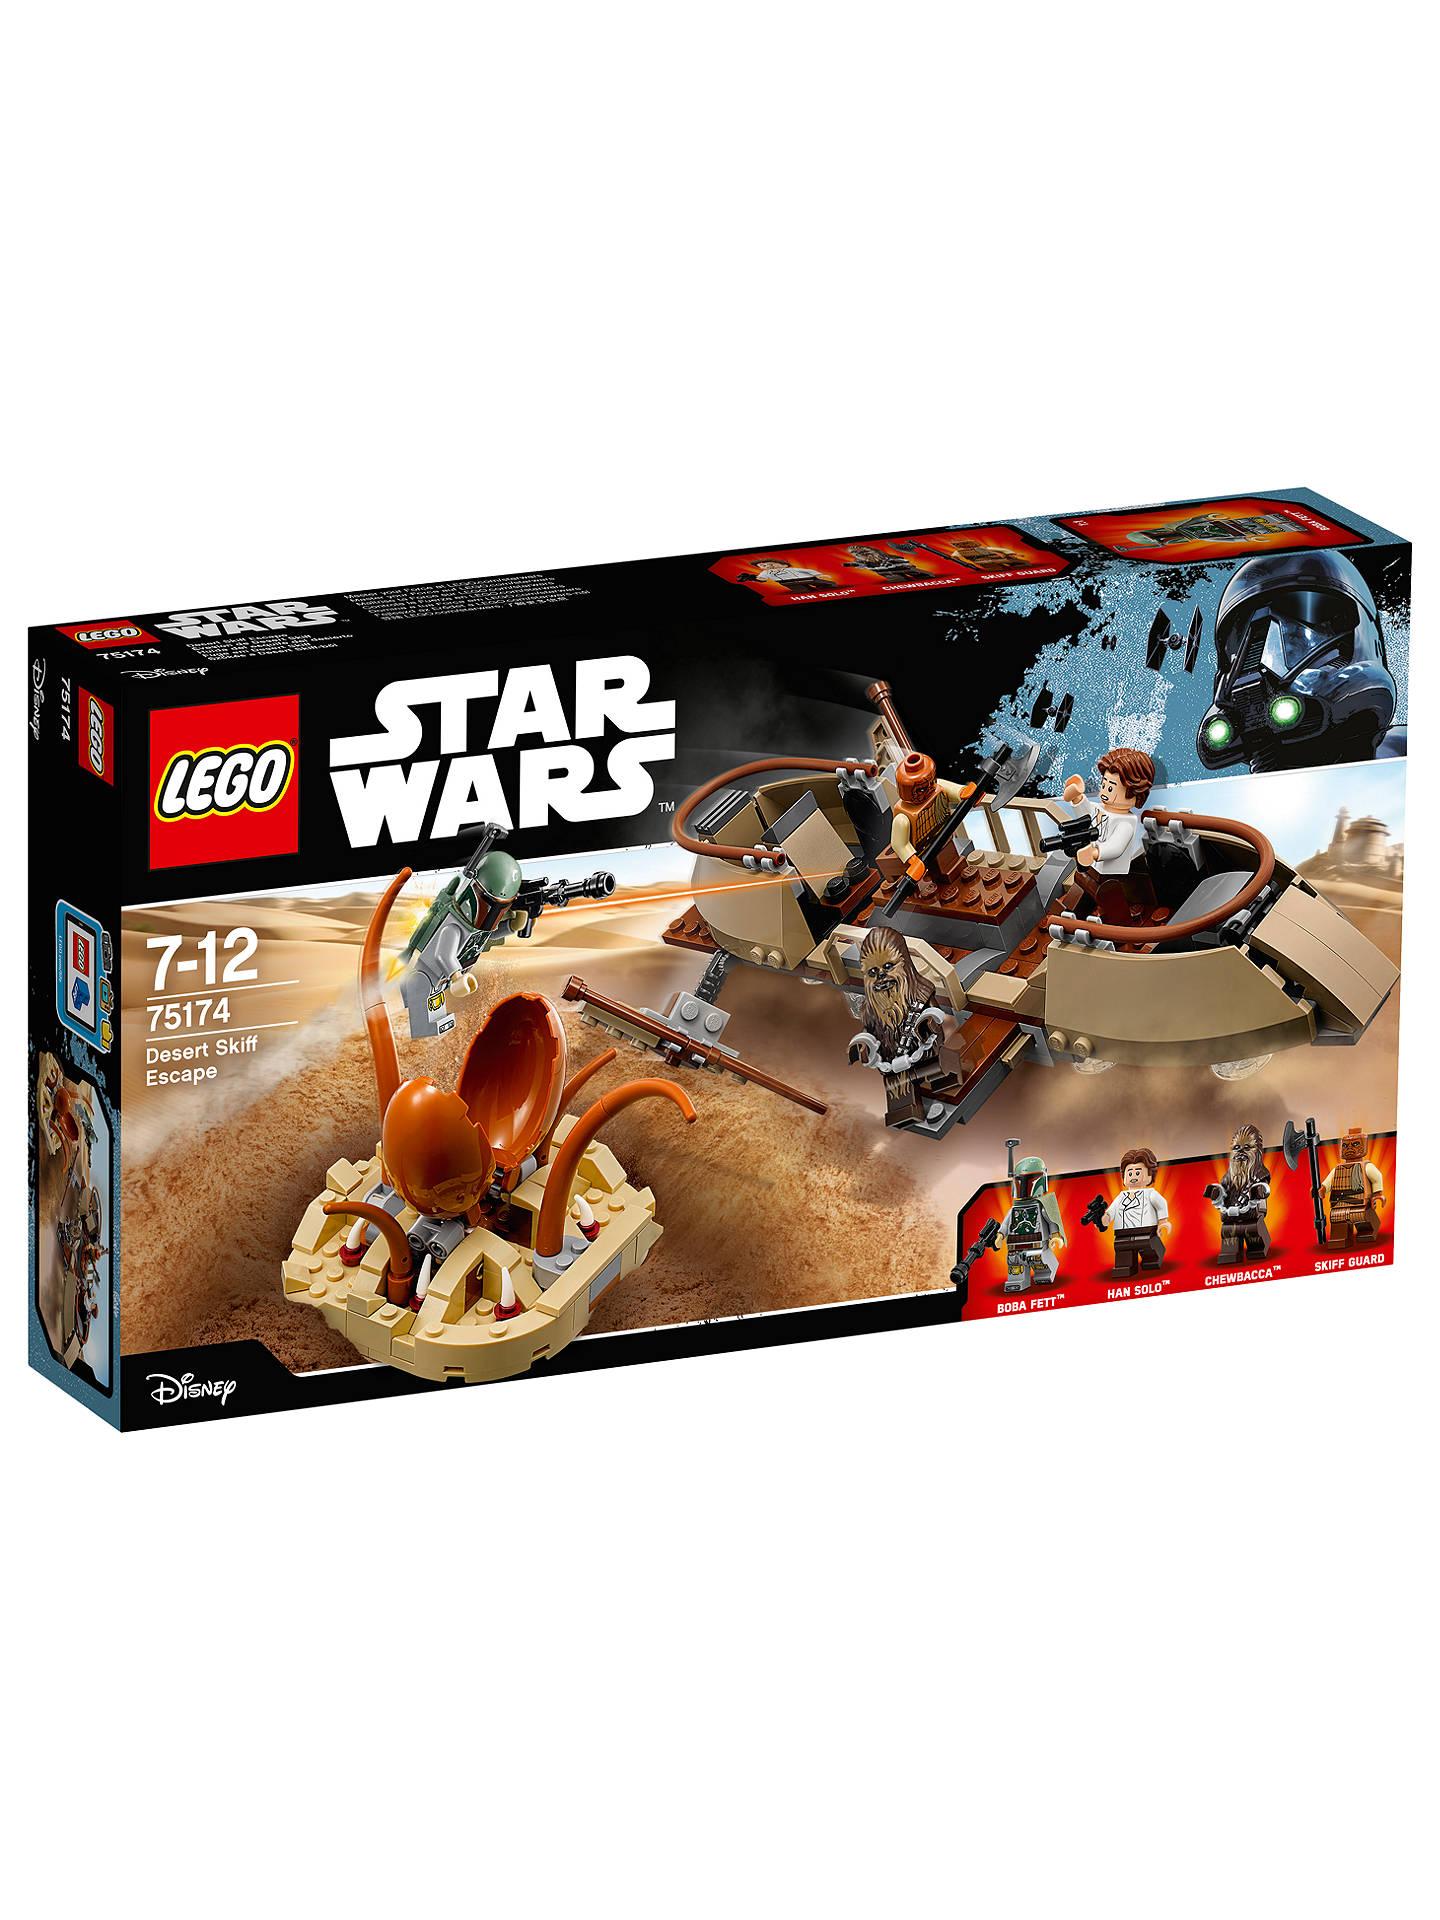 LEGO Star Wars 75174 Sarlacc's Pit at John Lewis & Partners